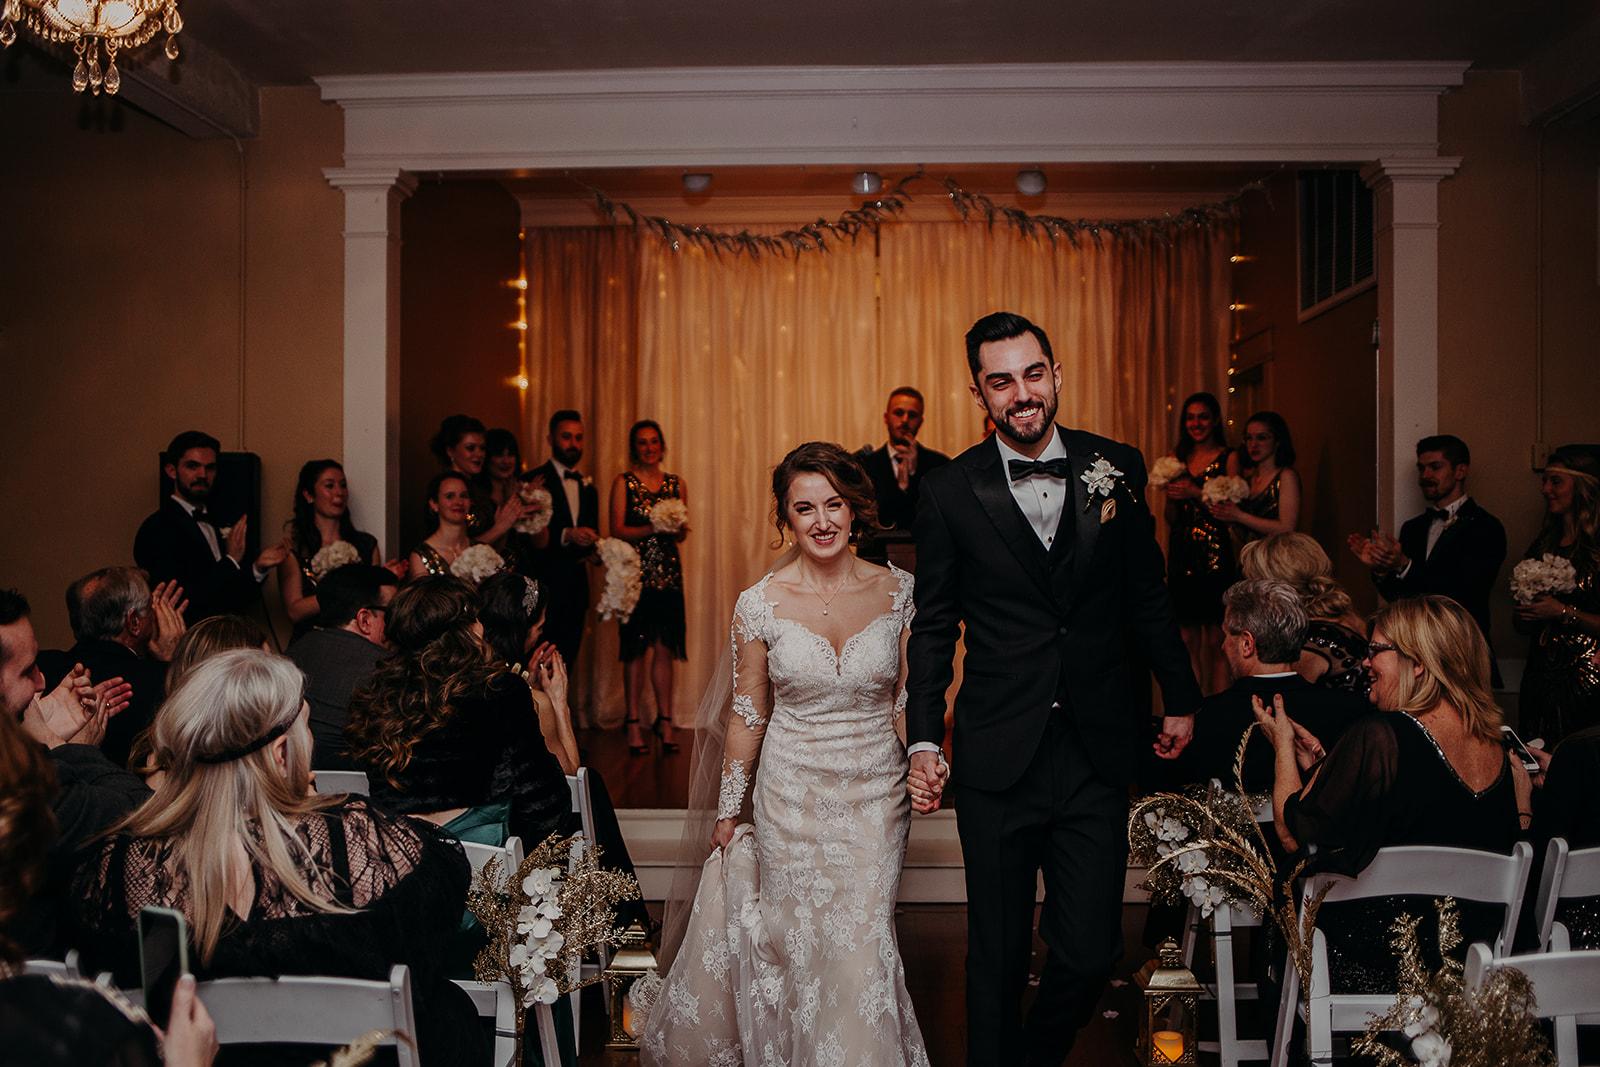 bellingham-wedding-broadway-hall-natalie-levi (125 of 143).jpg